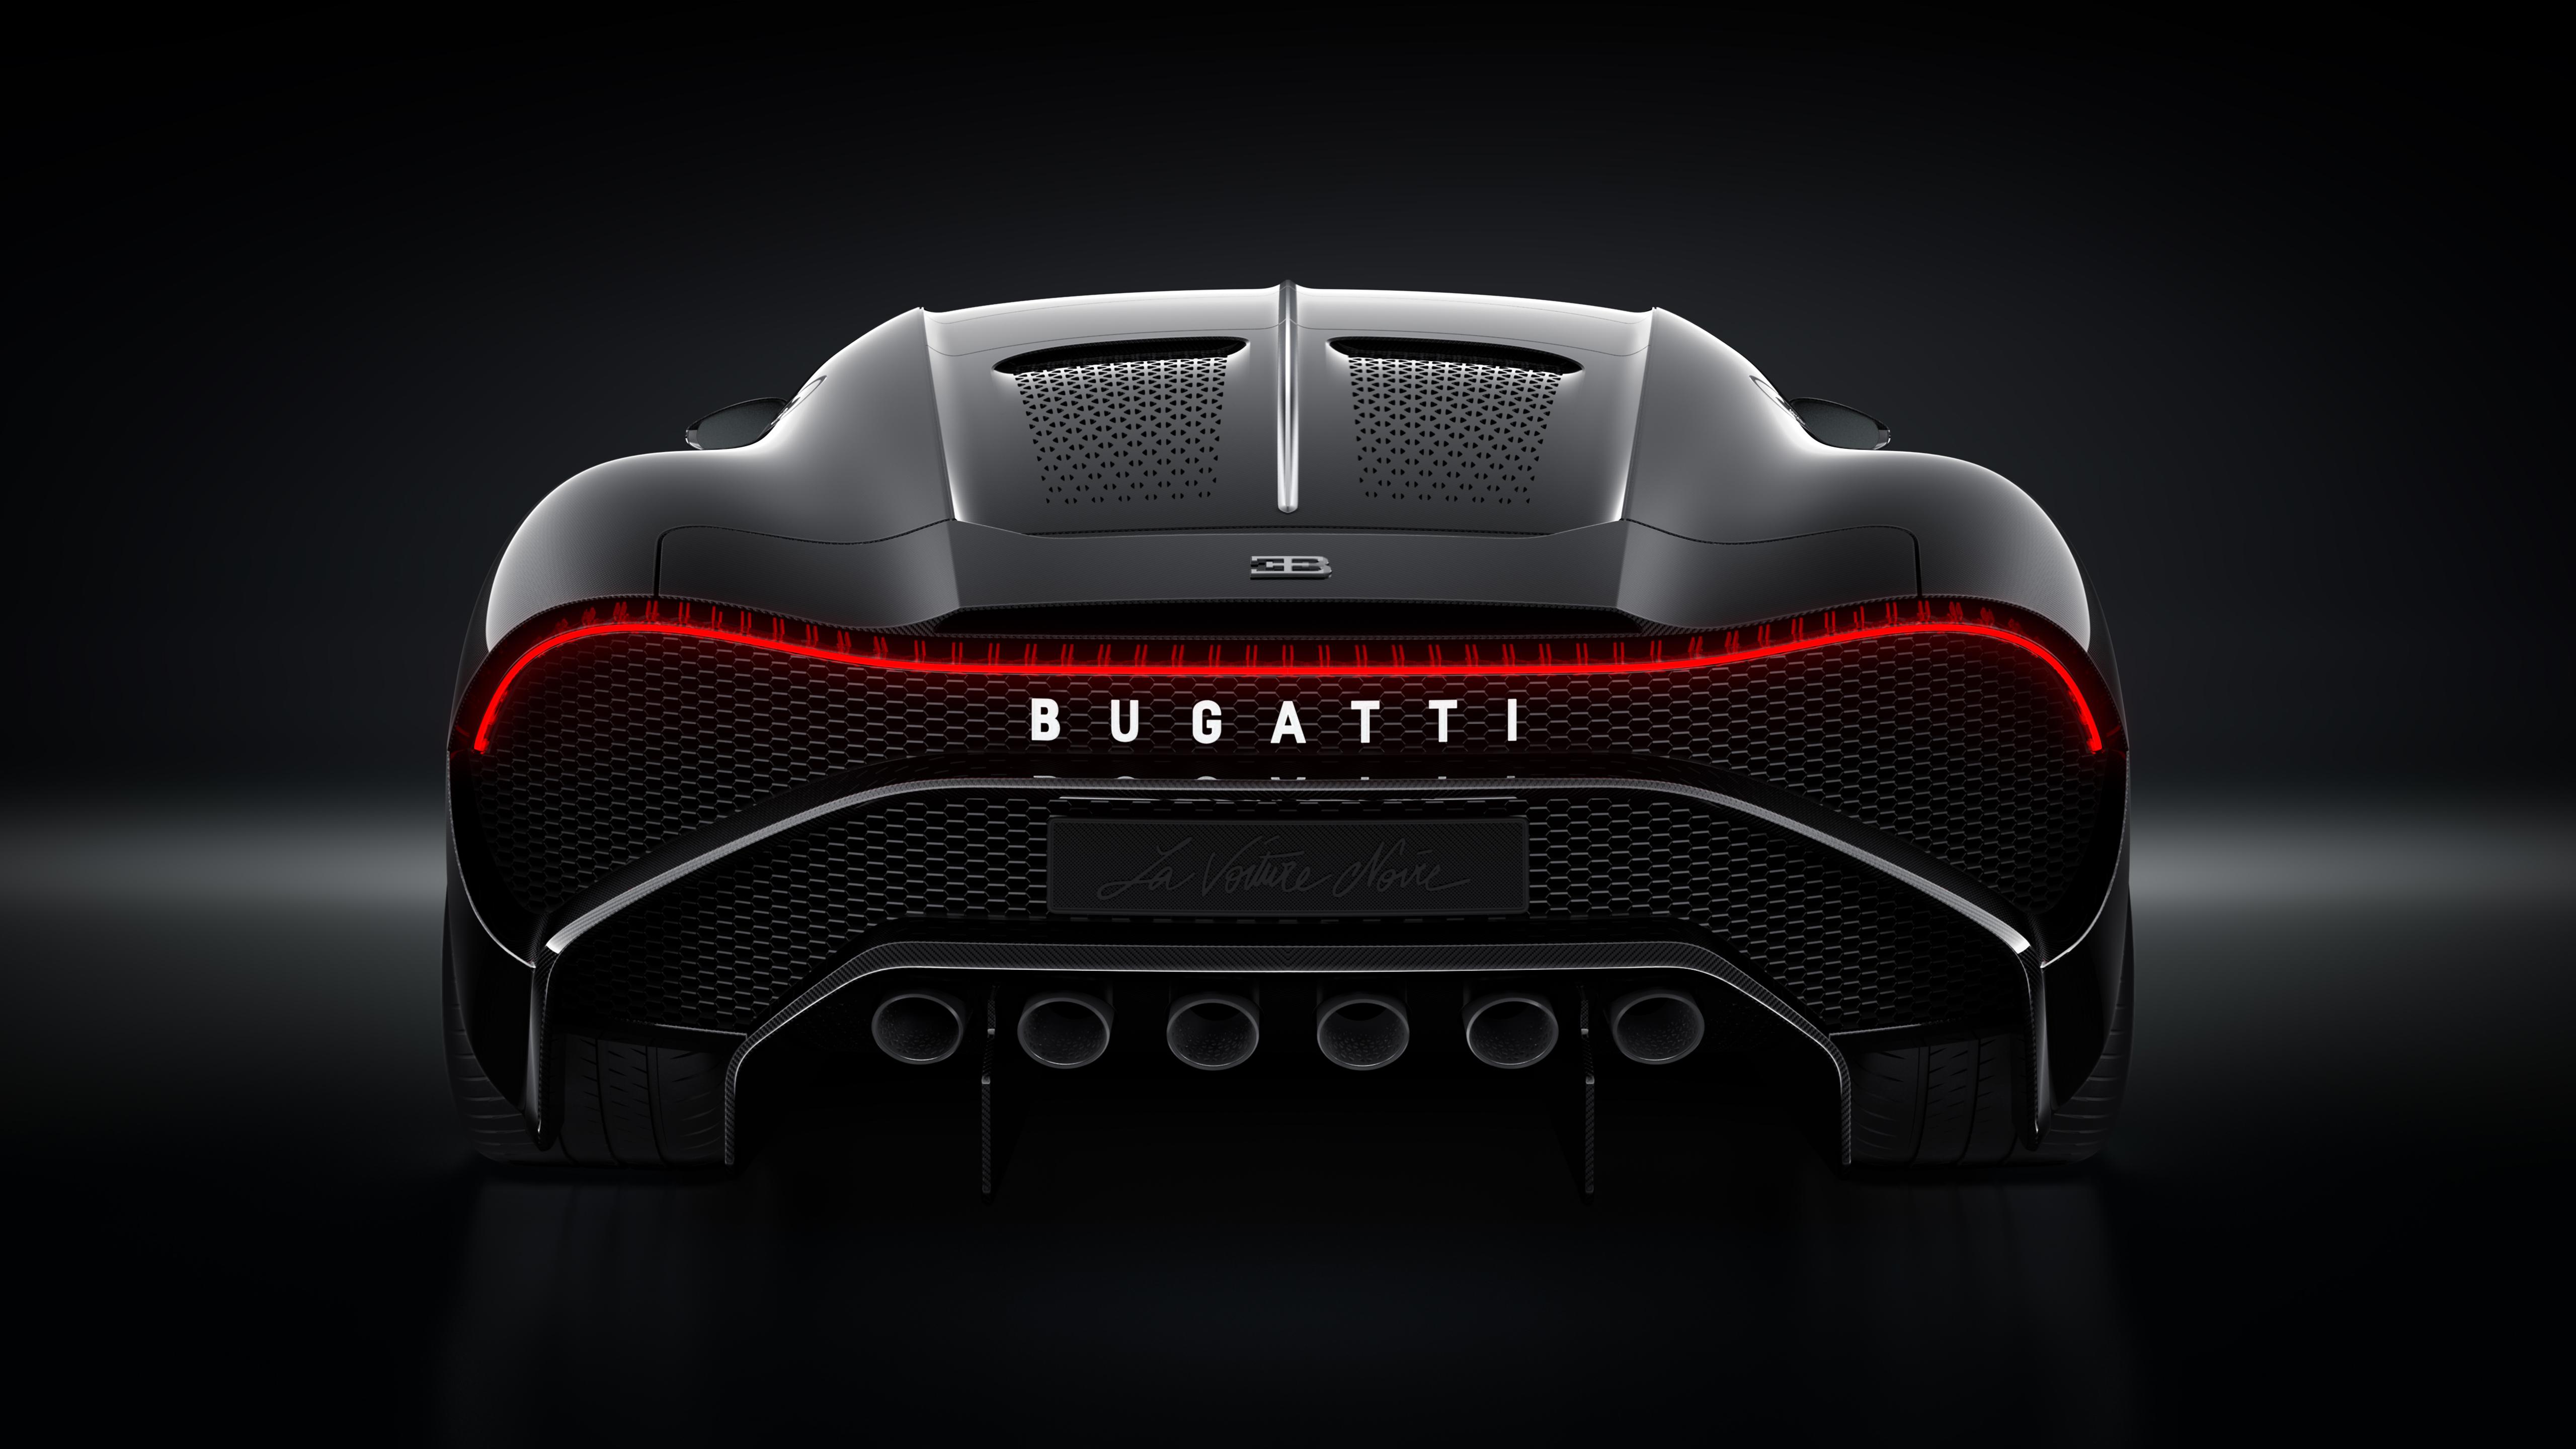 Bugatti La Voiture Noire 2019 4k 6 Wallpaper Hd Car Wallpapers Id 12199 Bugatti la voiture noire 2019 4k 3